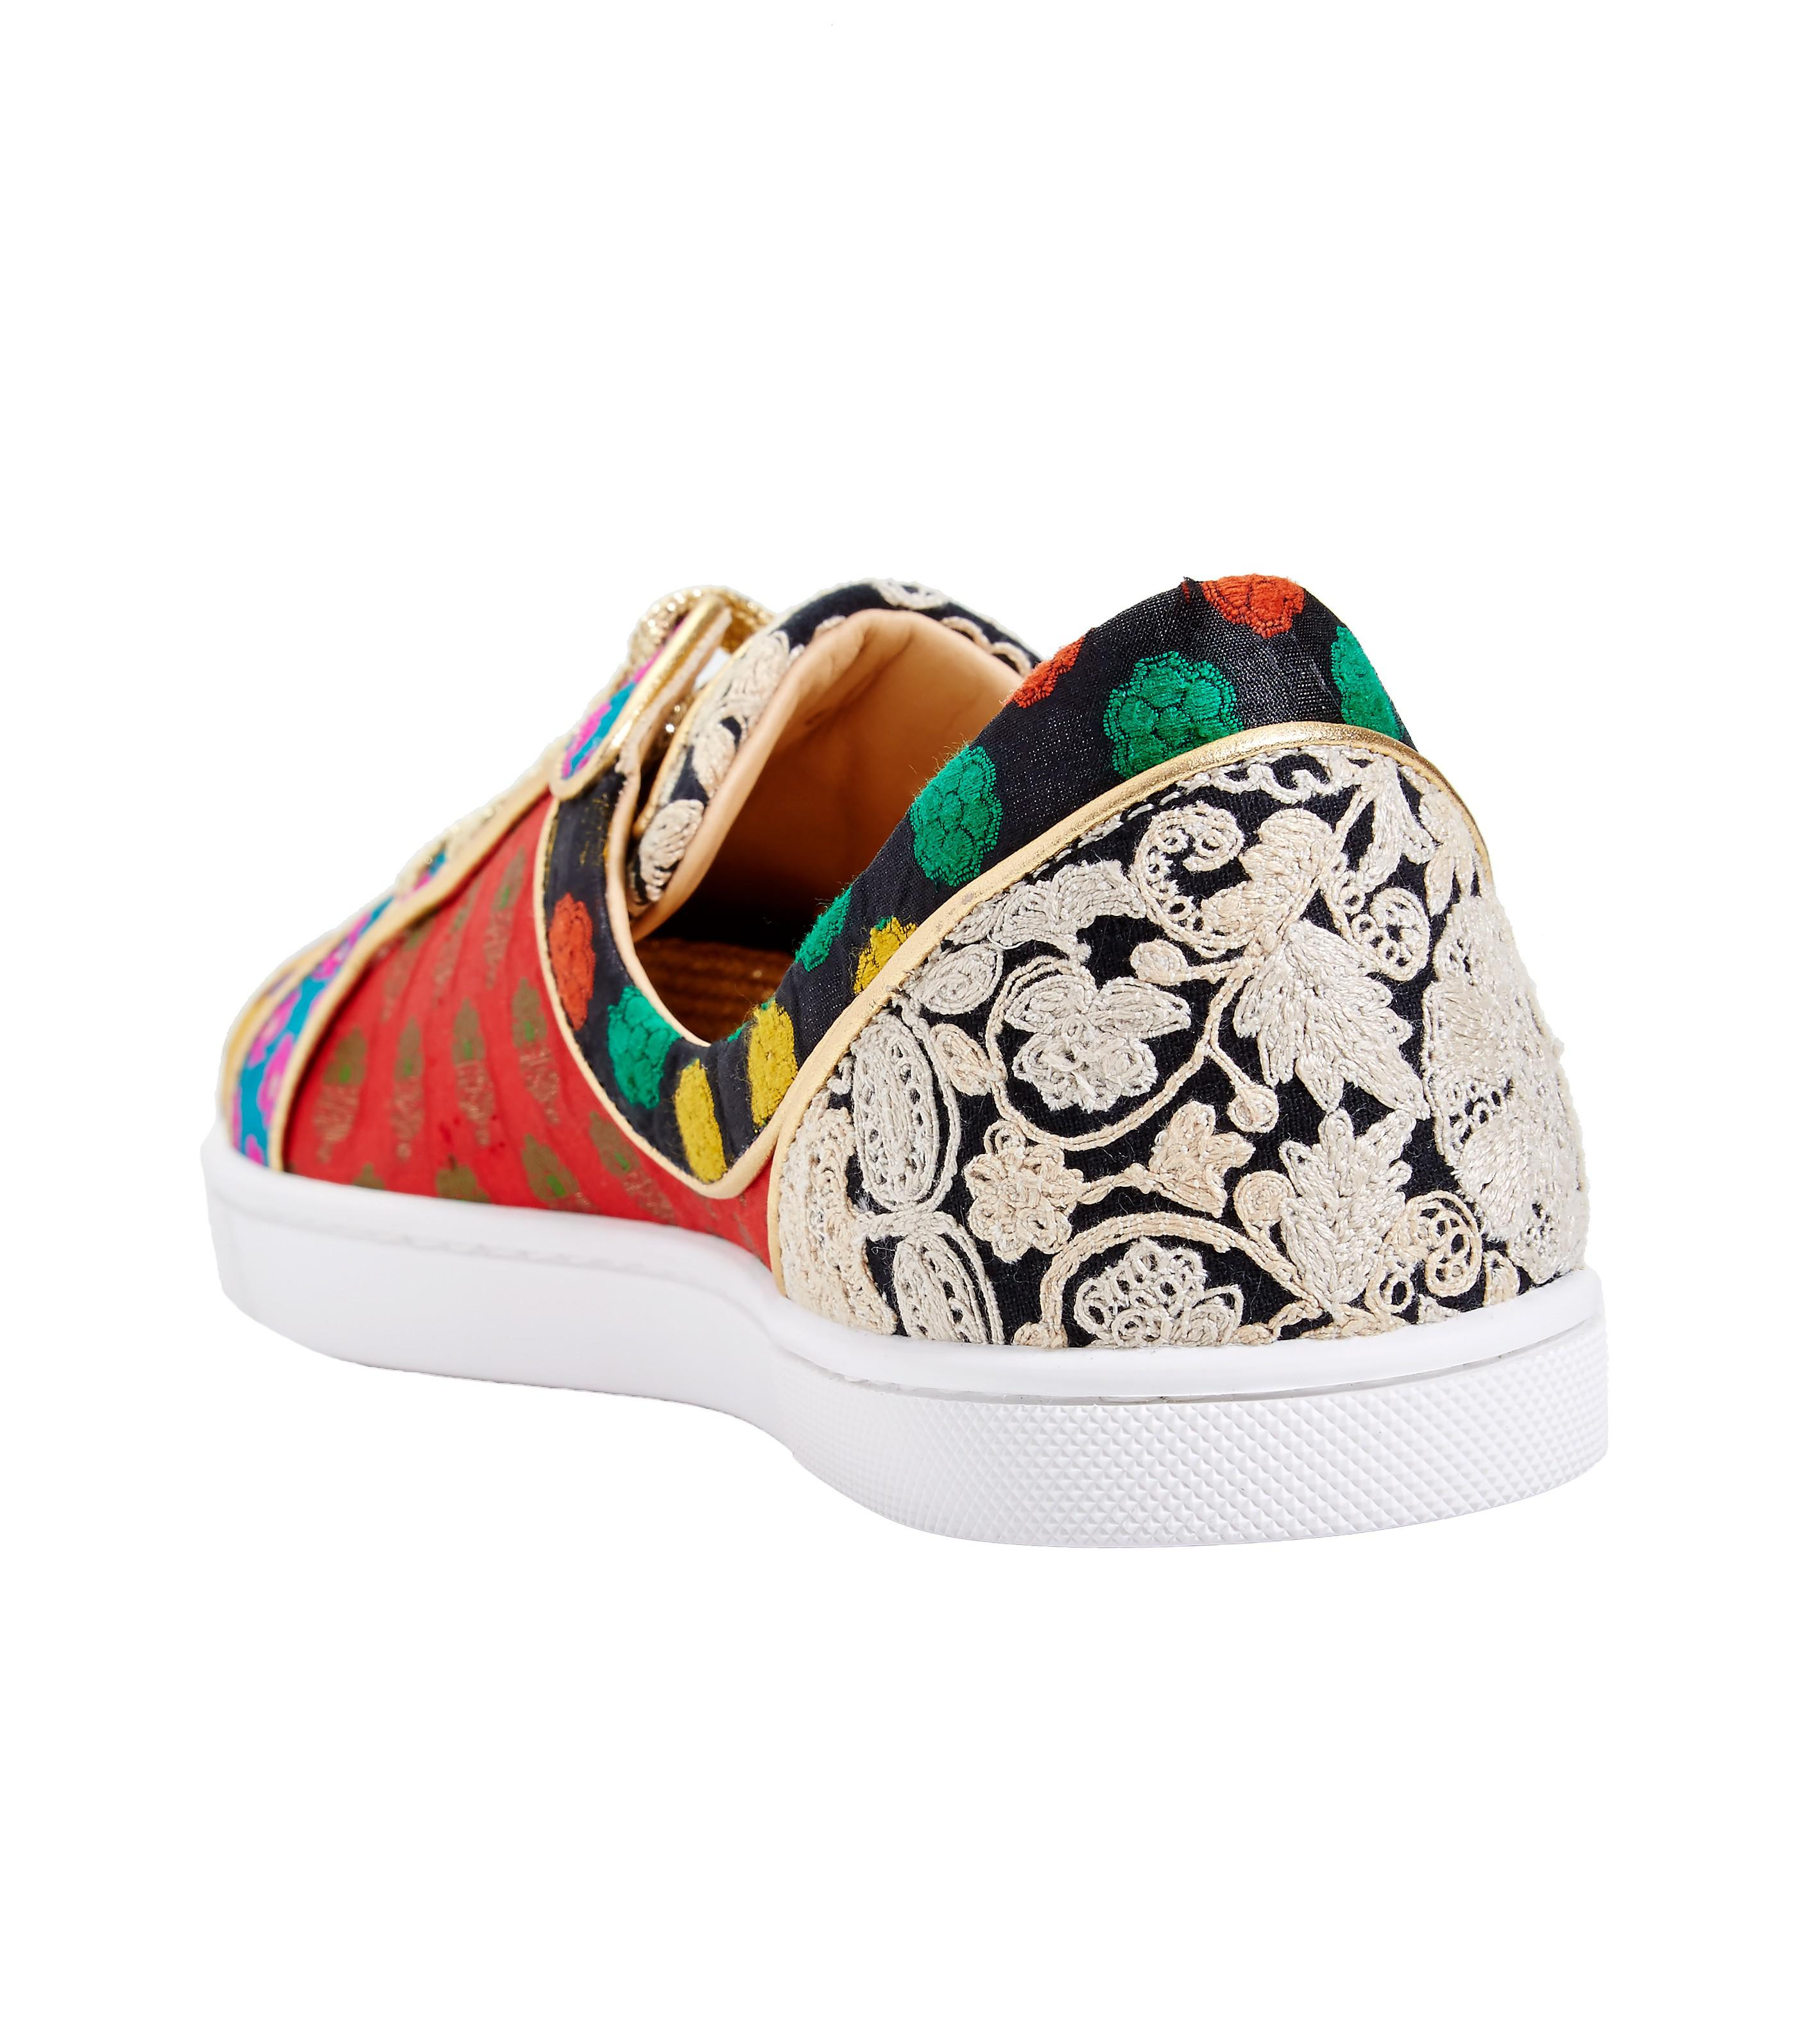 19a6c9cb1a1 denmark louboutin sneakers brown girl 047df f4eee